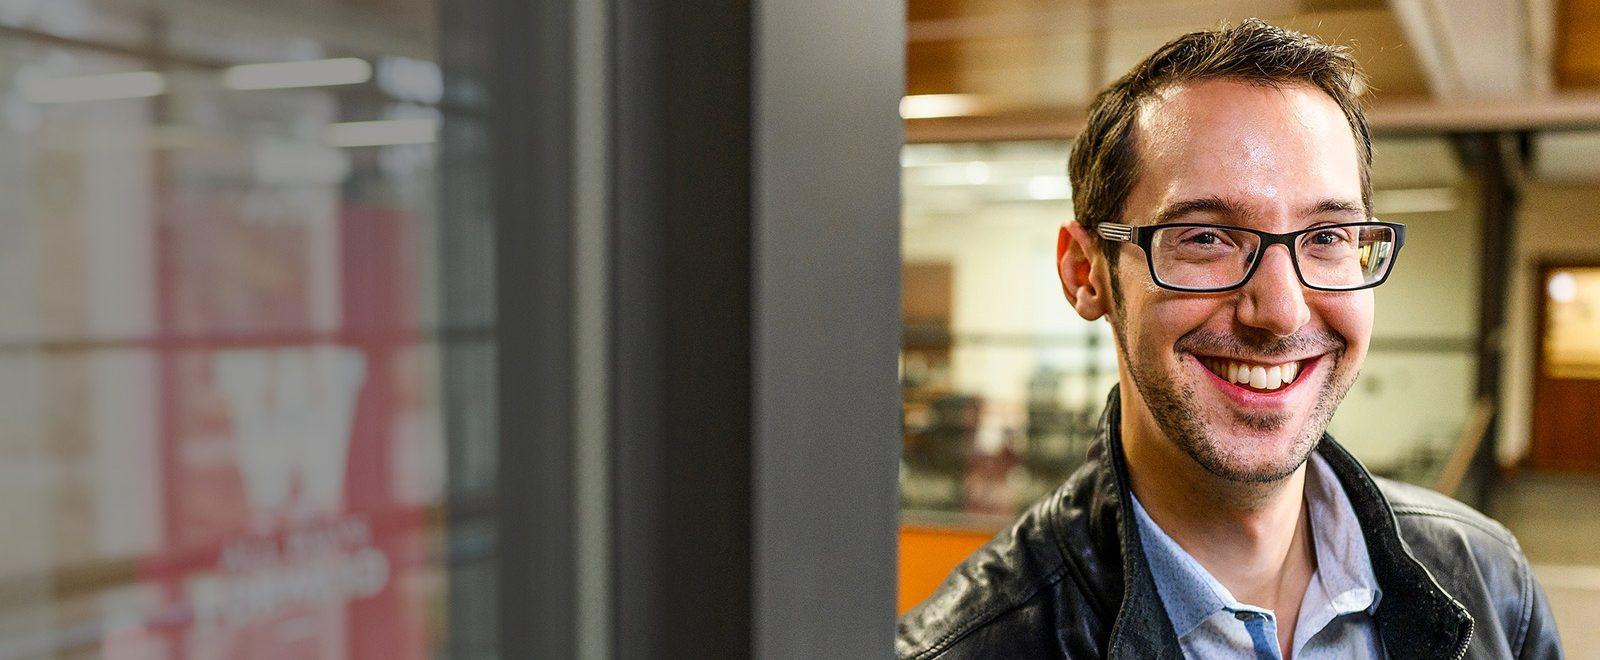 Brett Nachman poses in the Education Building.